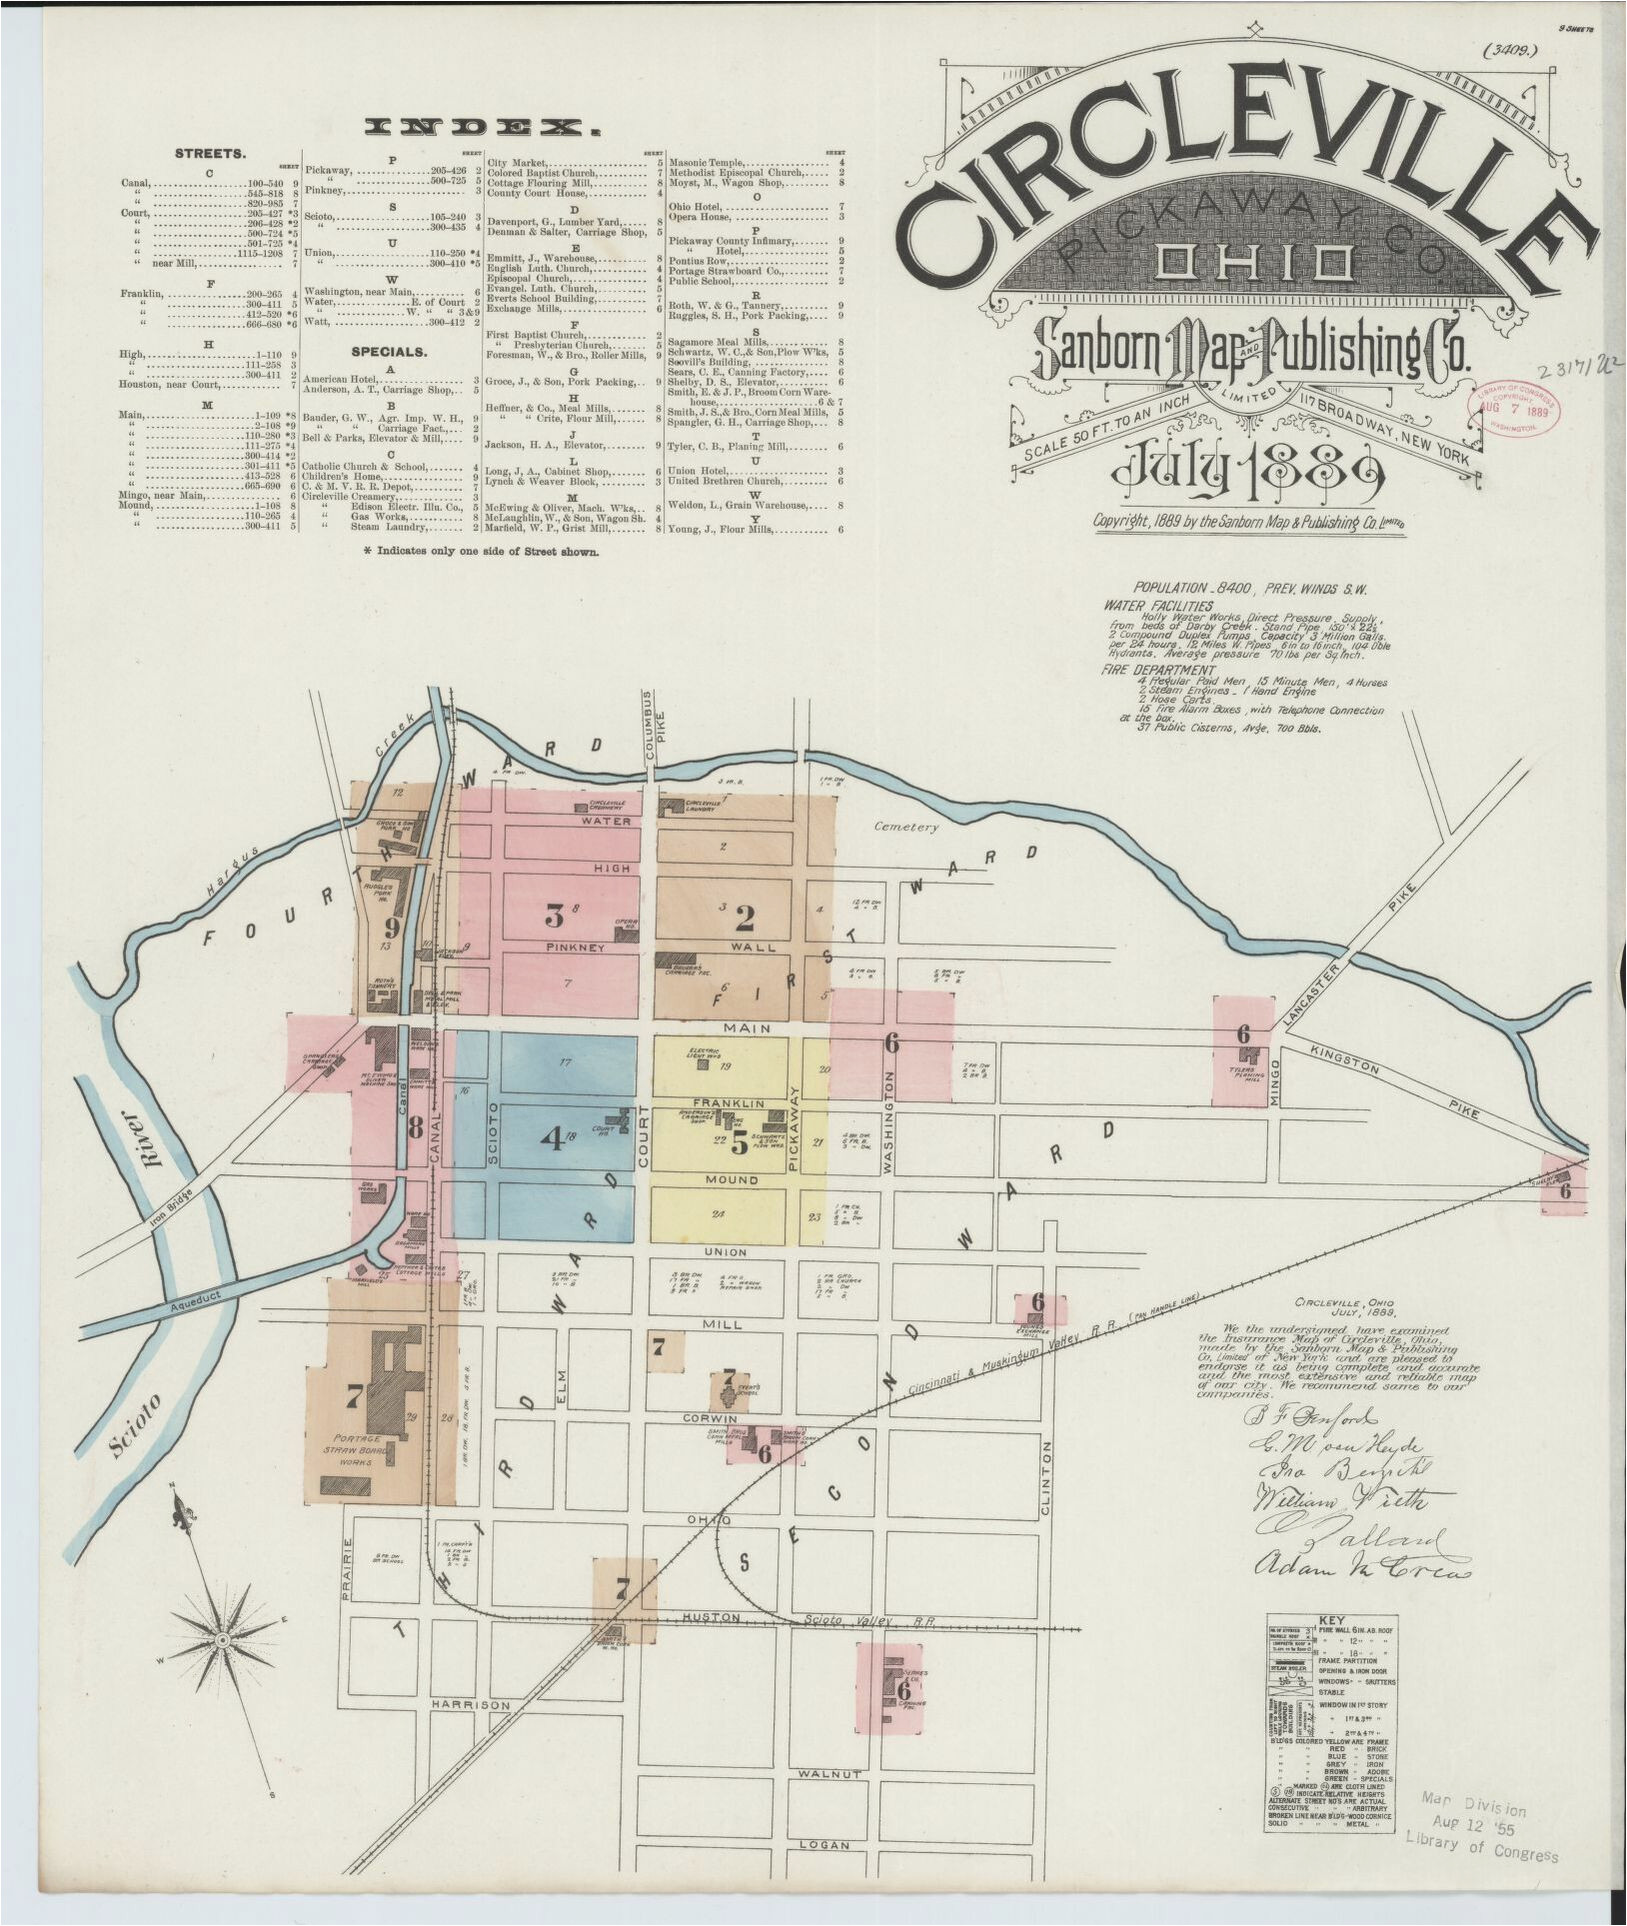 Sanborn Maps Ohio Sanborn Maps 1880 to 1889 Ohio Library Of